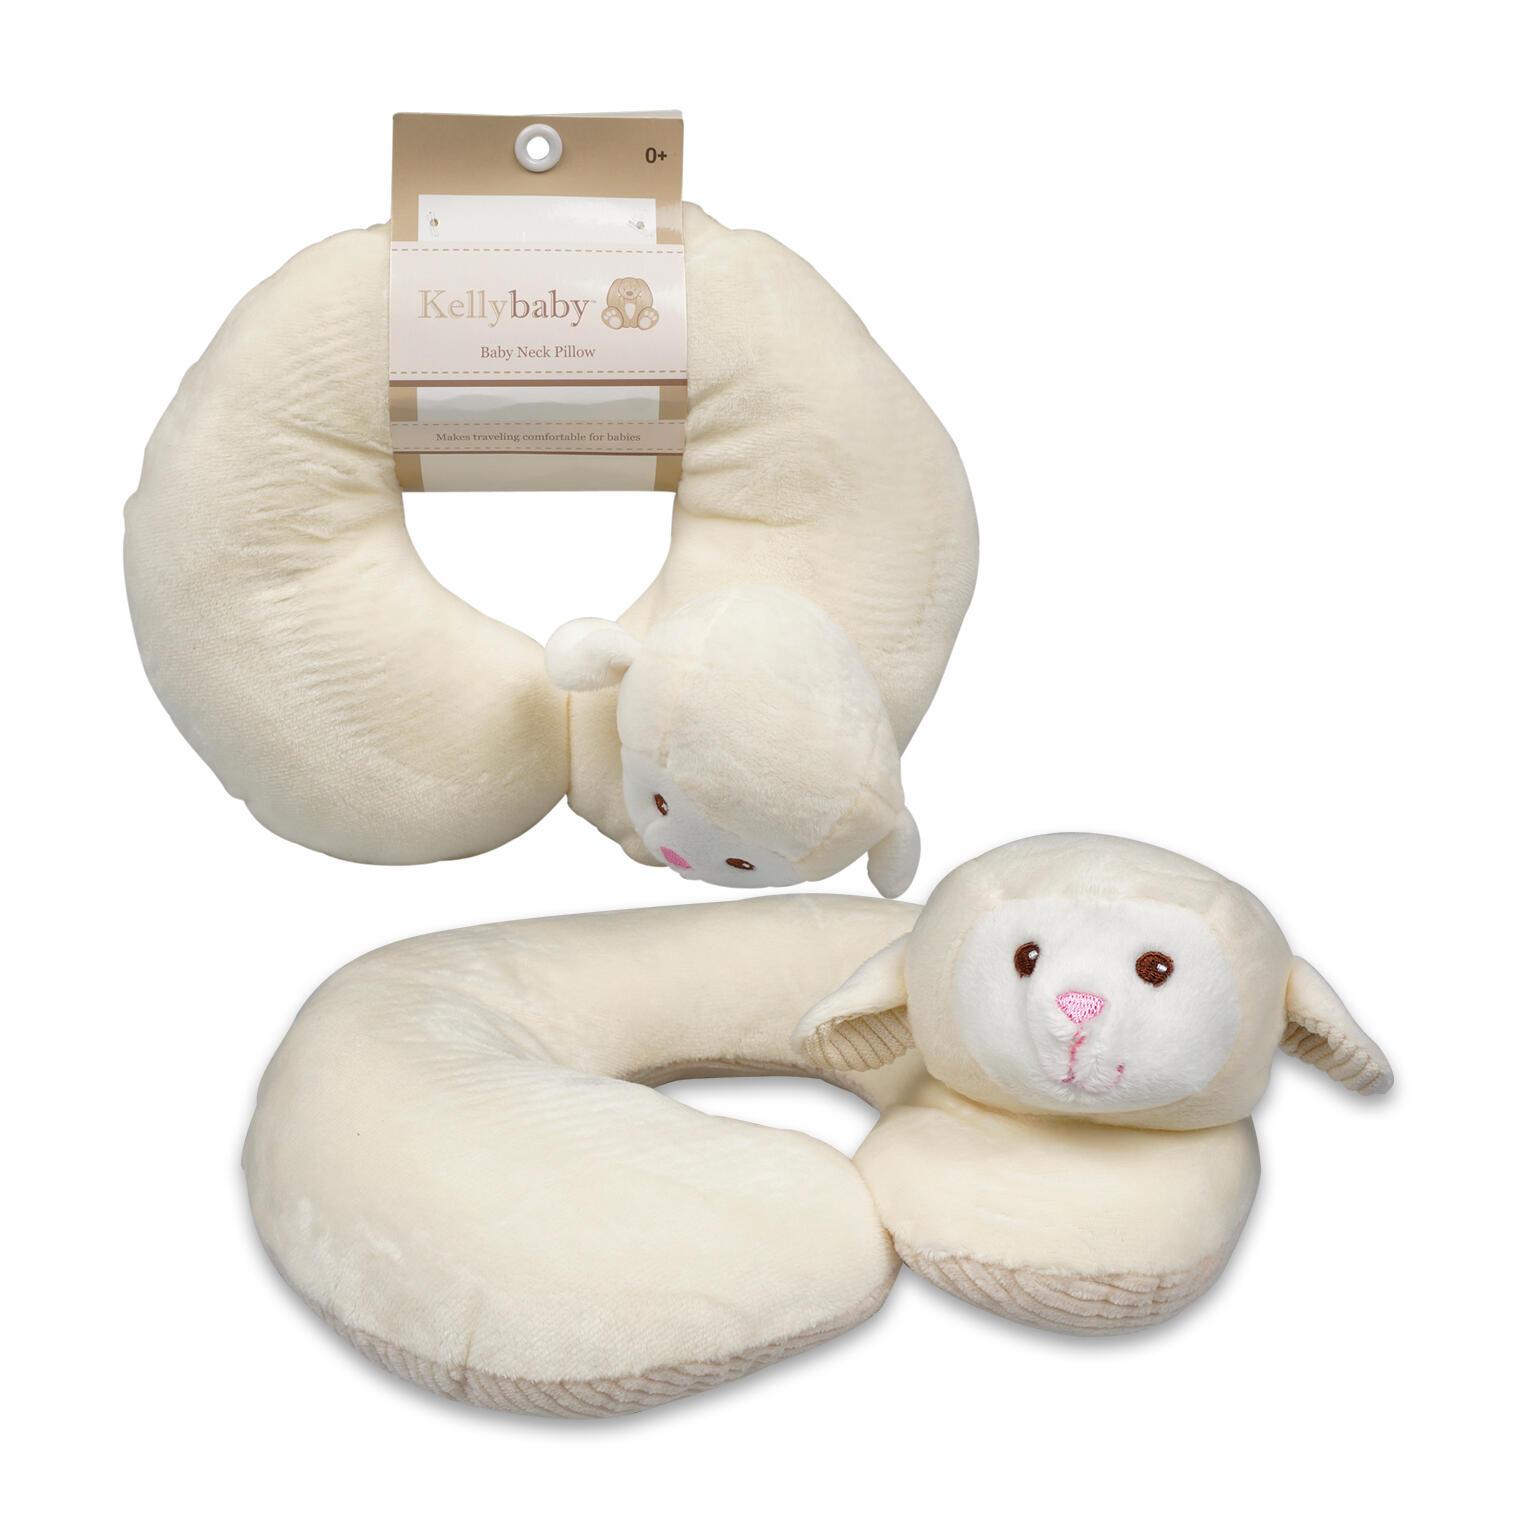 KellyBaby Cream Lamb Baby Travel Neck Pillow